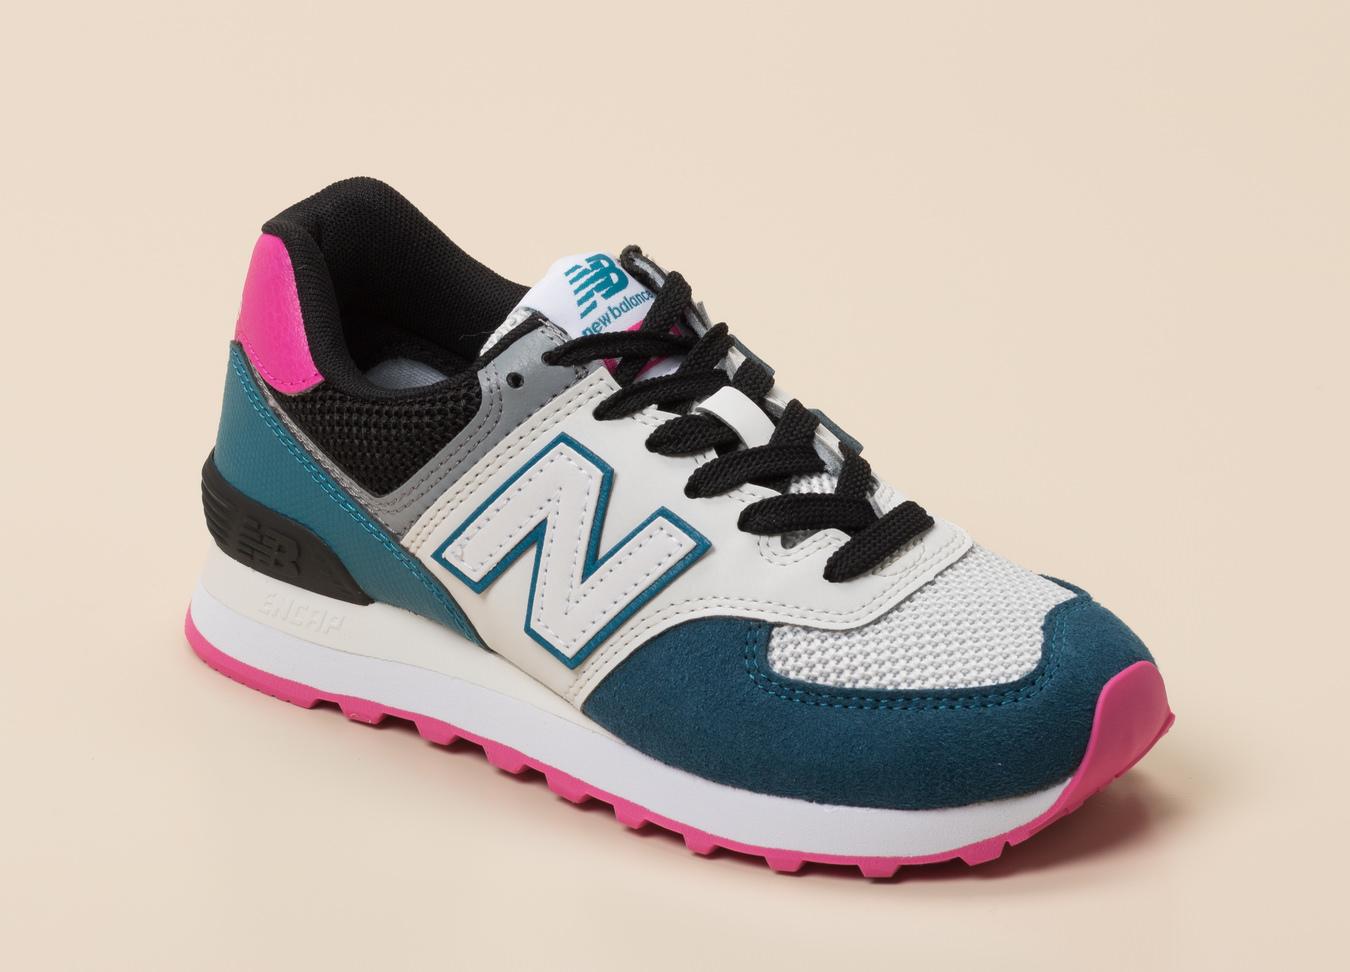 New Balance Damen;Herren Sneaker in multi kaufen   Zumnorde Online-Shop